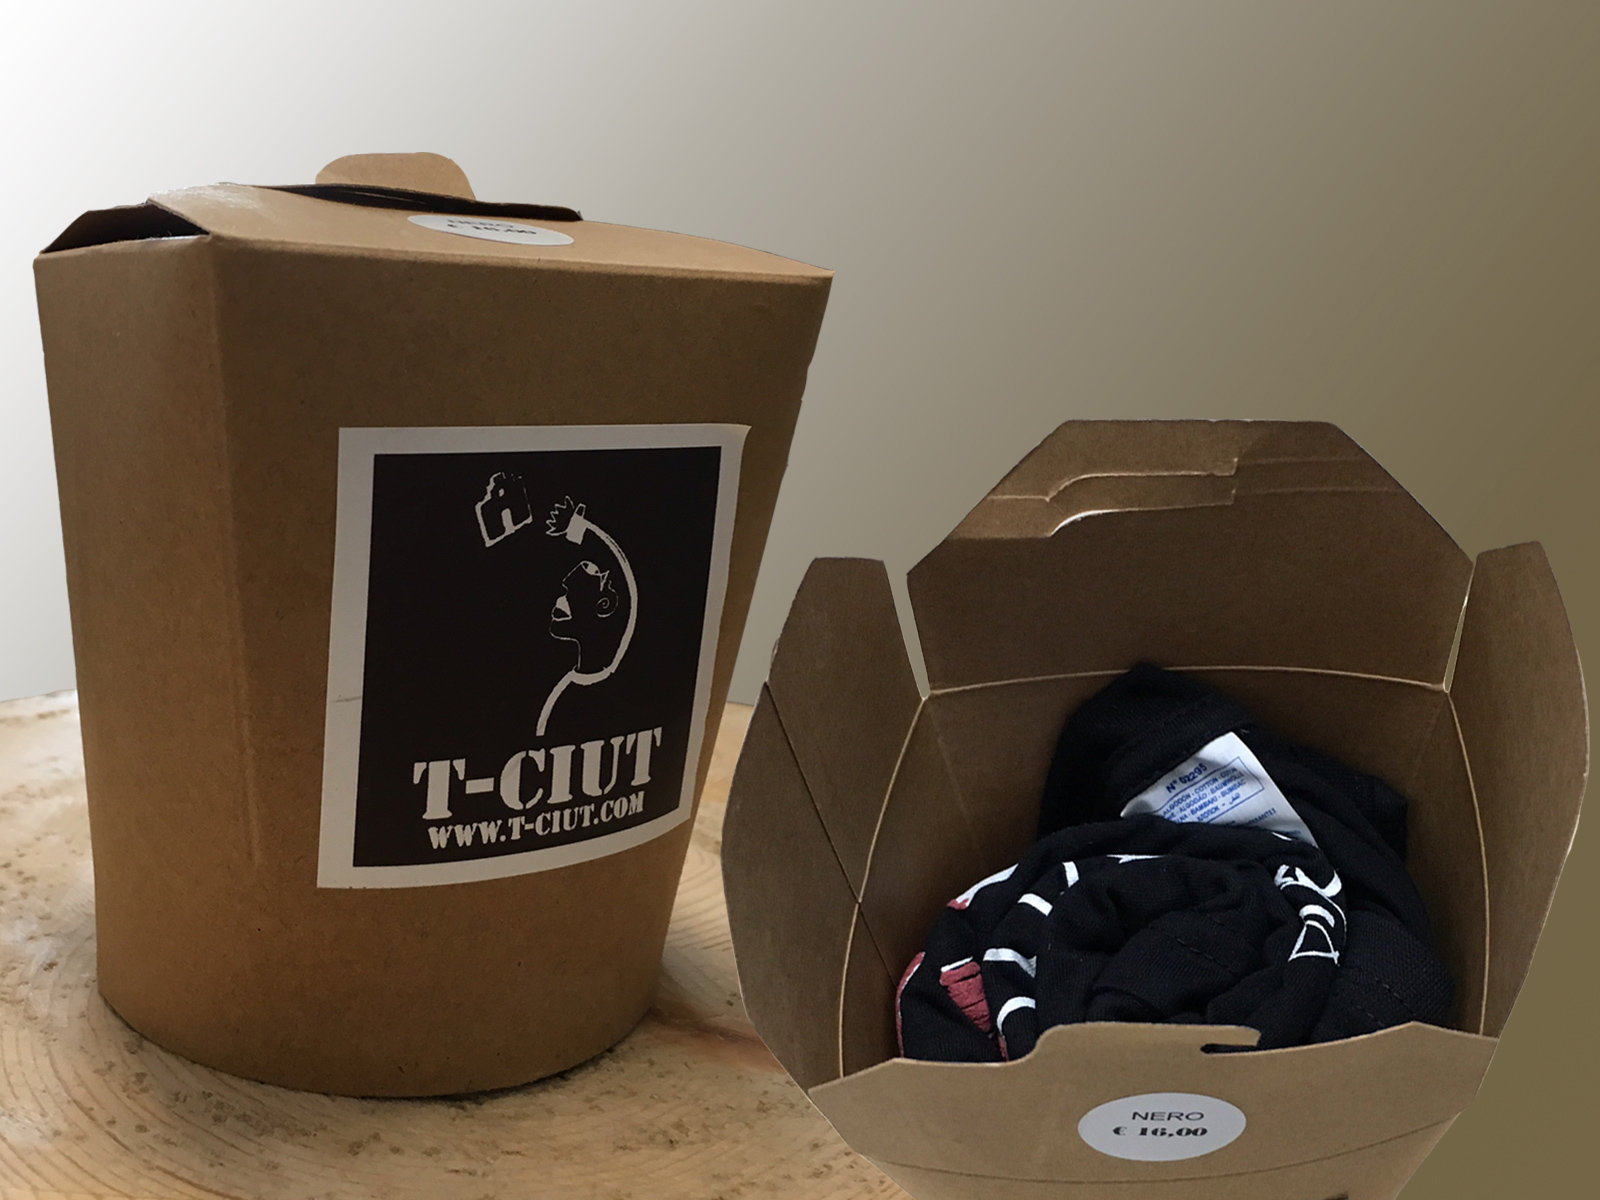 Packaging t-shirt T-ciut